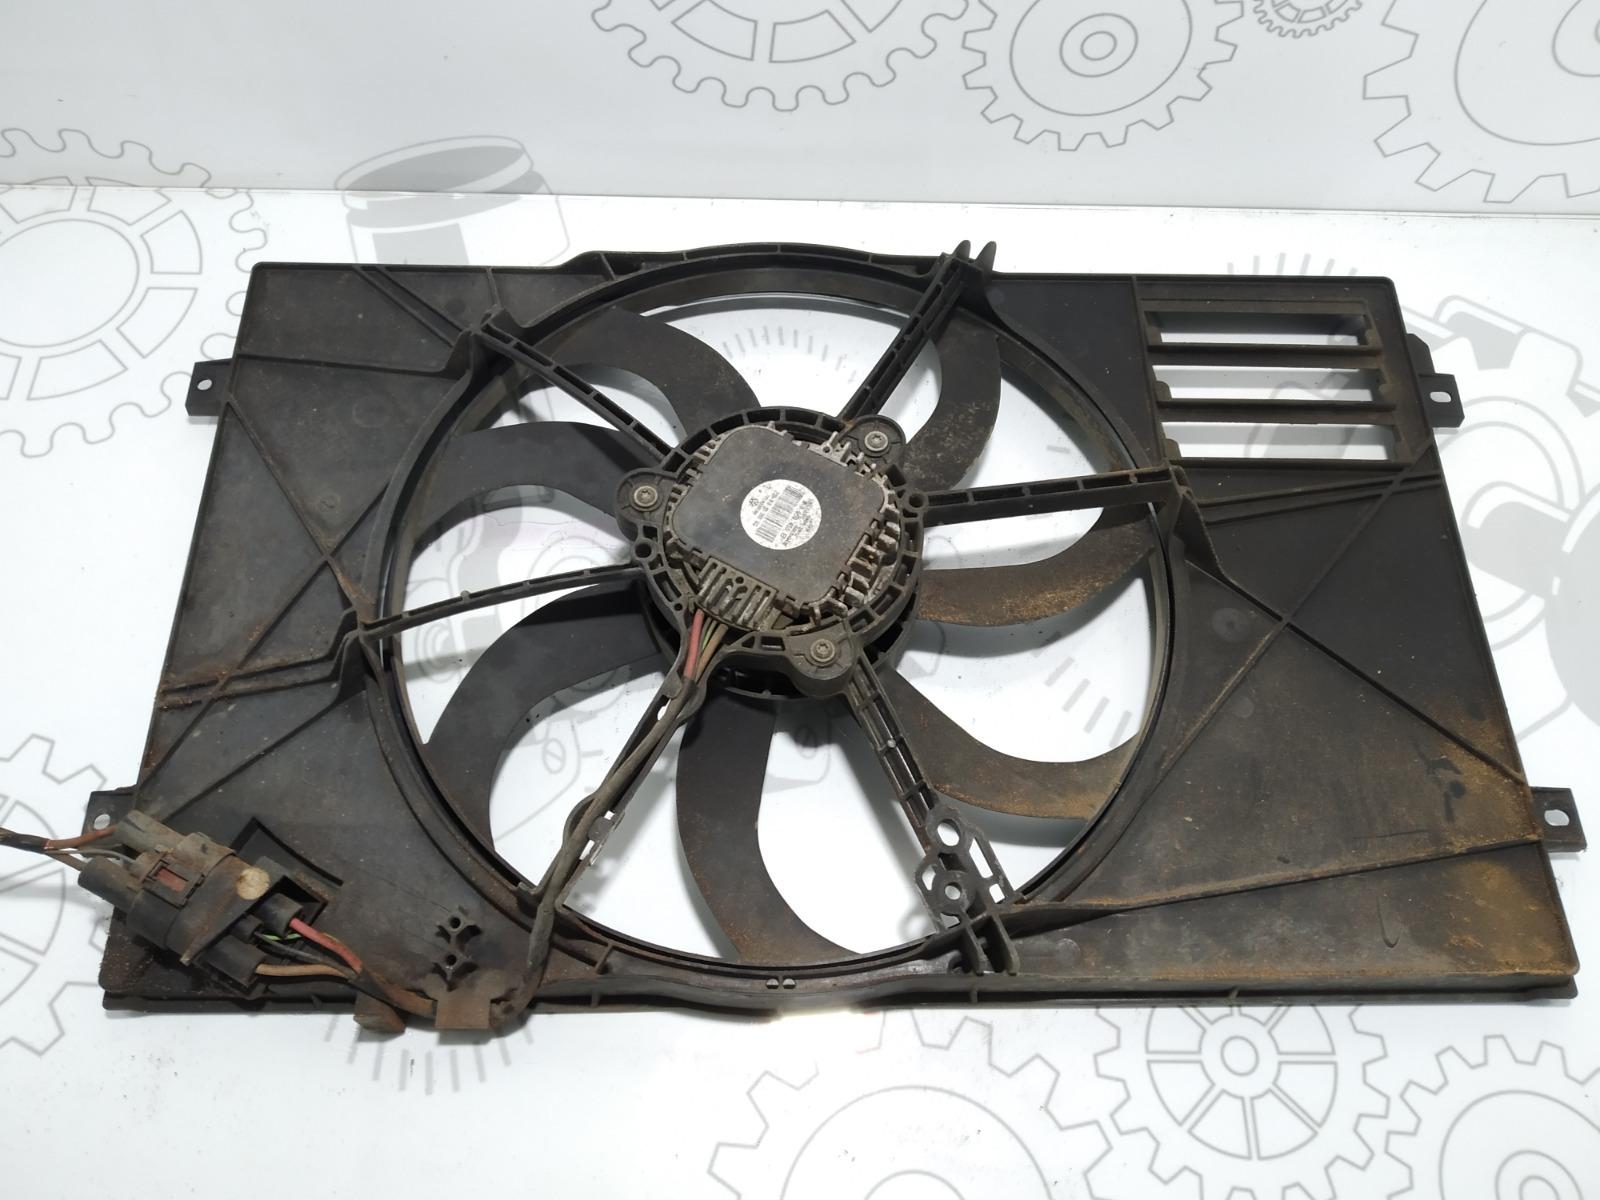 Вентилятор радиатора Seat Altea 1.9 TDI 2008 (б/у)